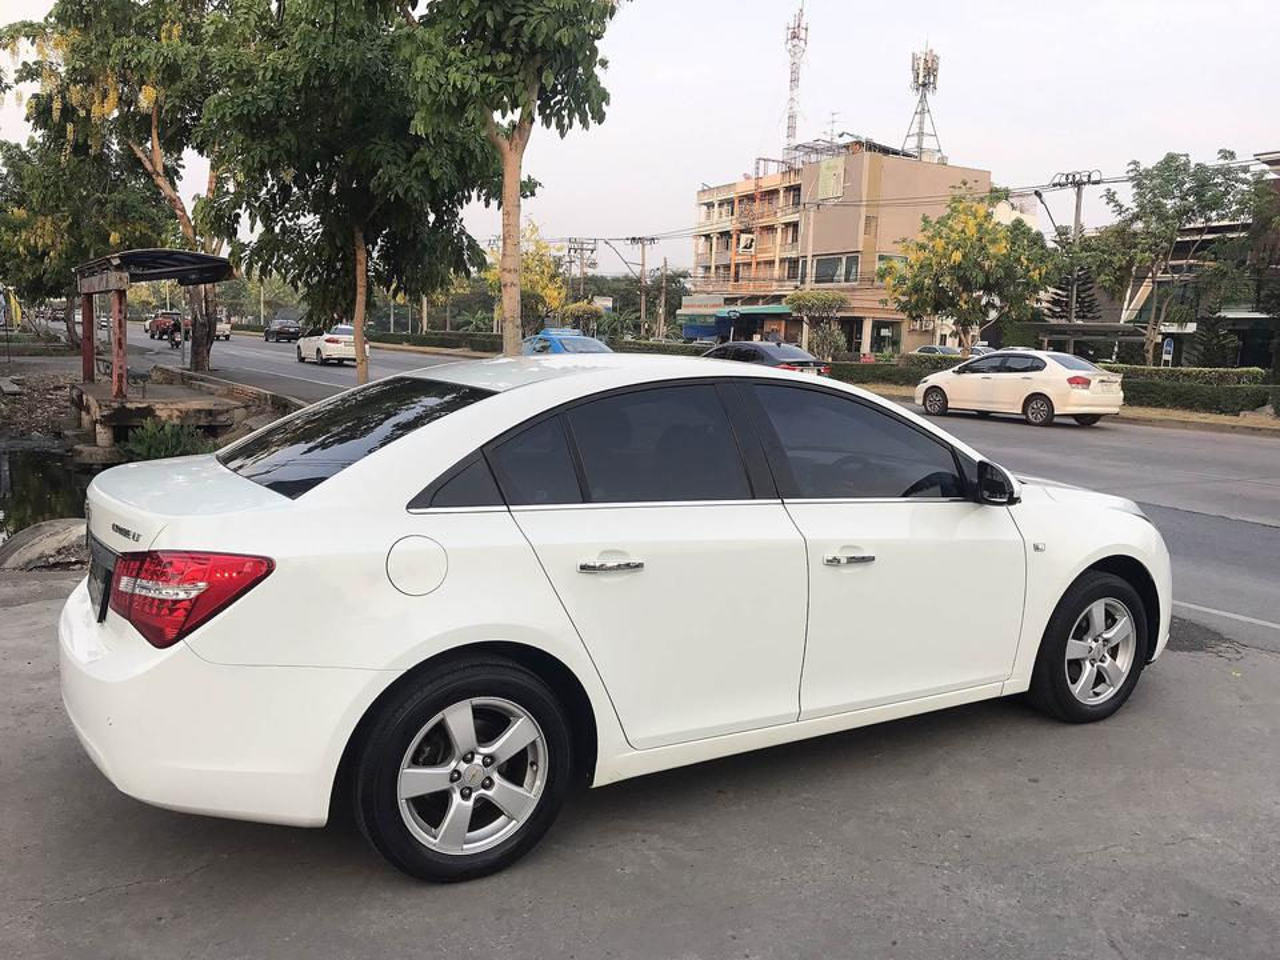 CHEVROLET CRUZE 1.8 LT auto ปี2011 สีขาว รถบ้านมือเดียวไม่มีชนสวยเดิม รูปที่ 3